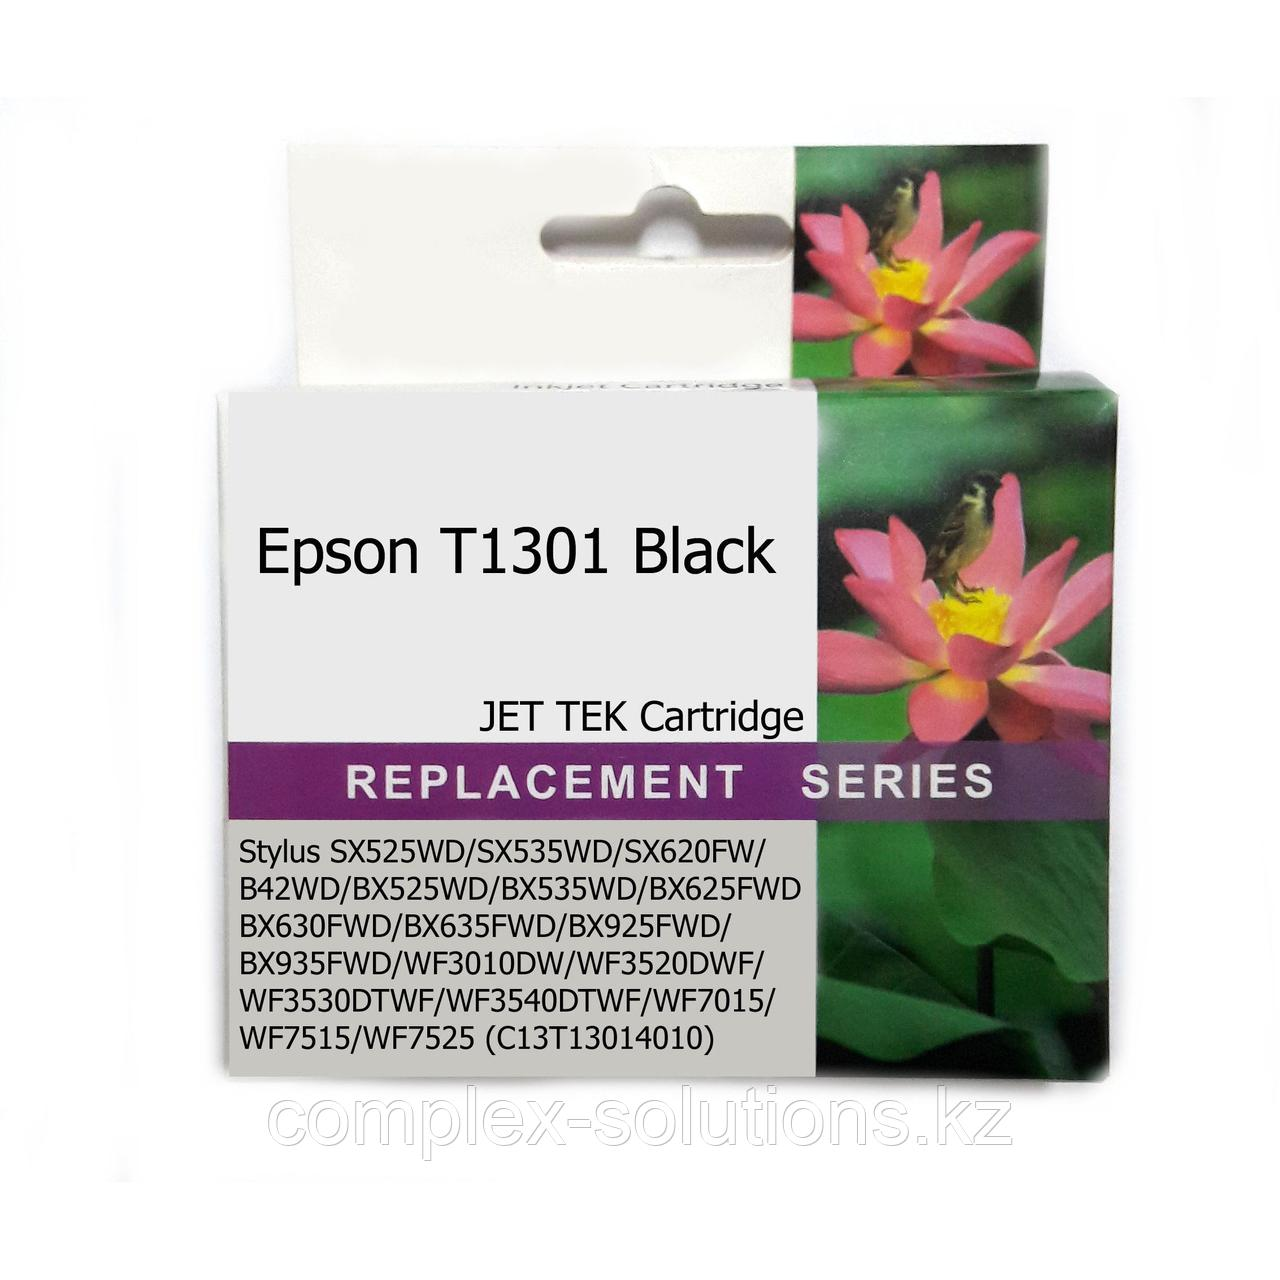 Картридж EPSON T1301 Black JET TEK | [качественный дубликат]